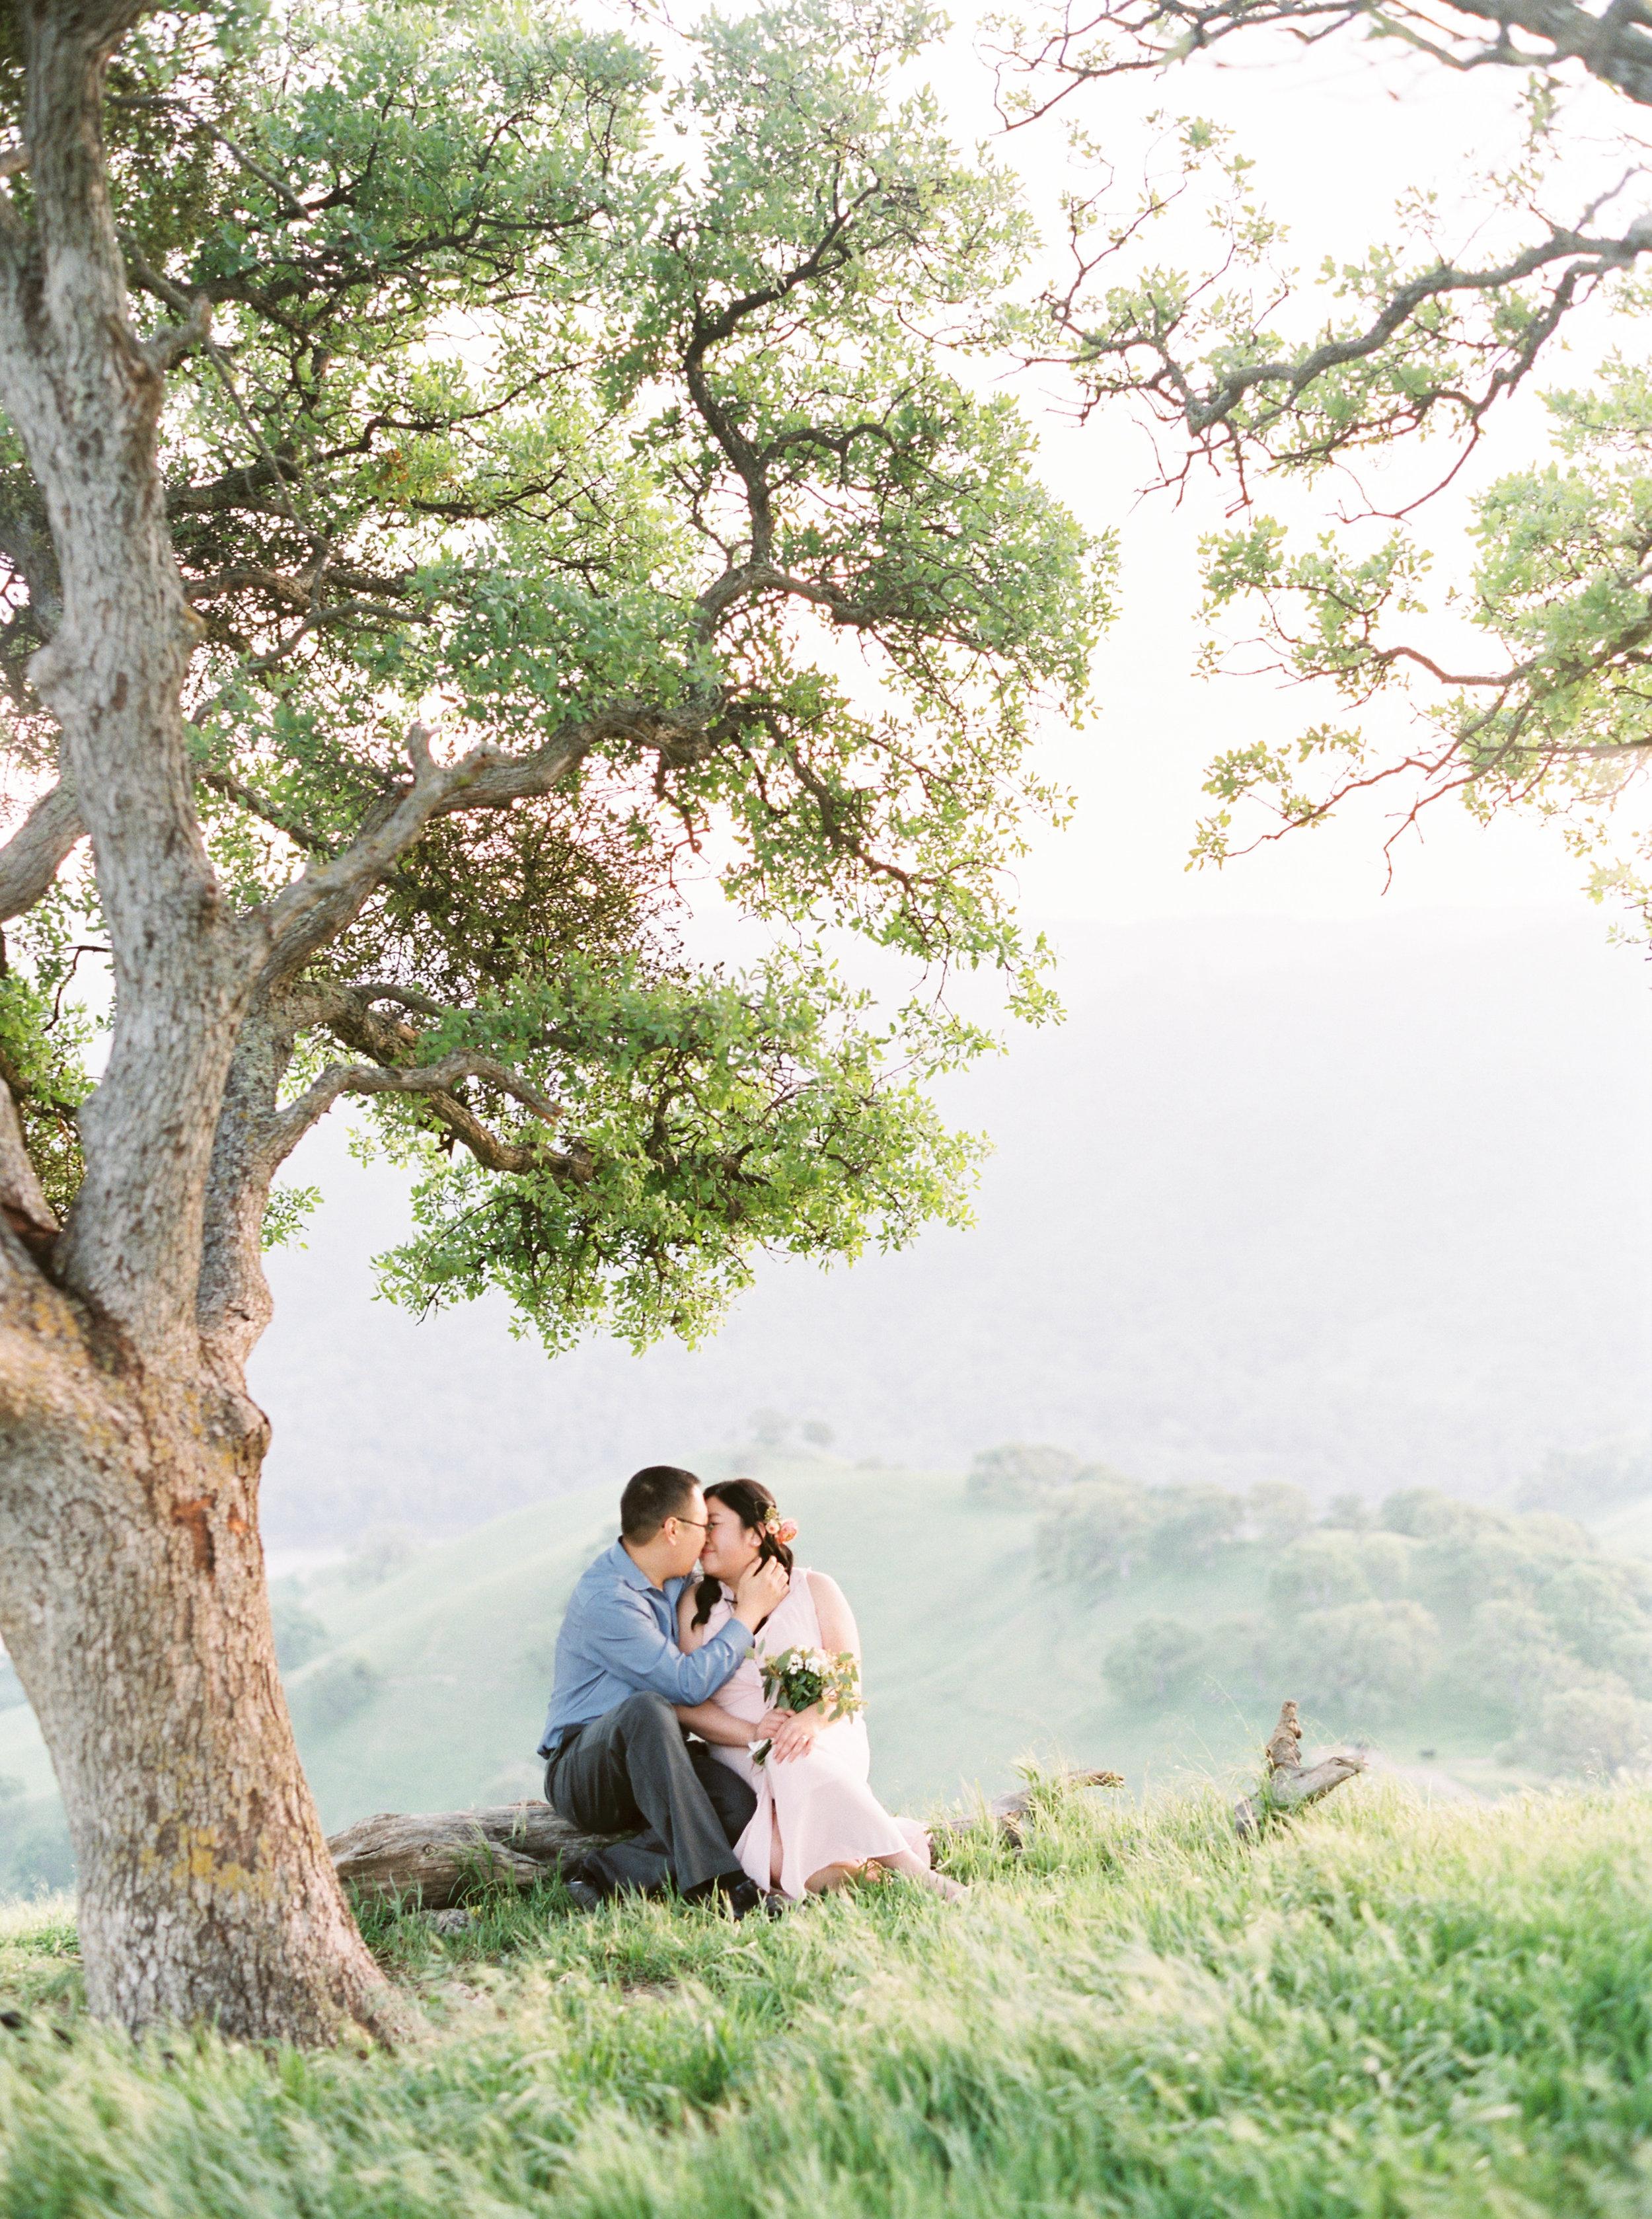 del-valle-livermore-bay-area-wedding-photographer-29.jpg